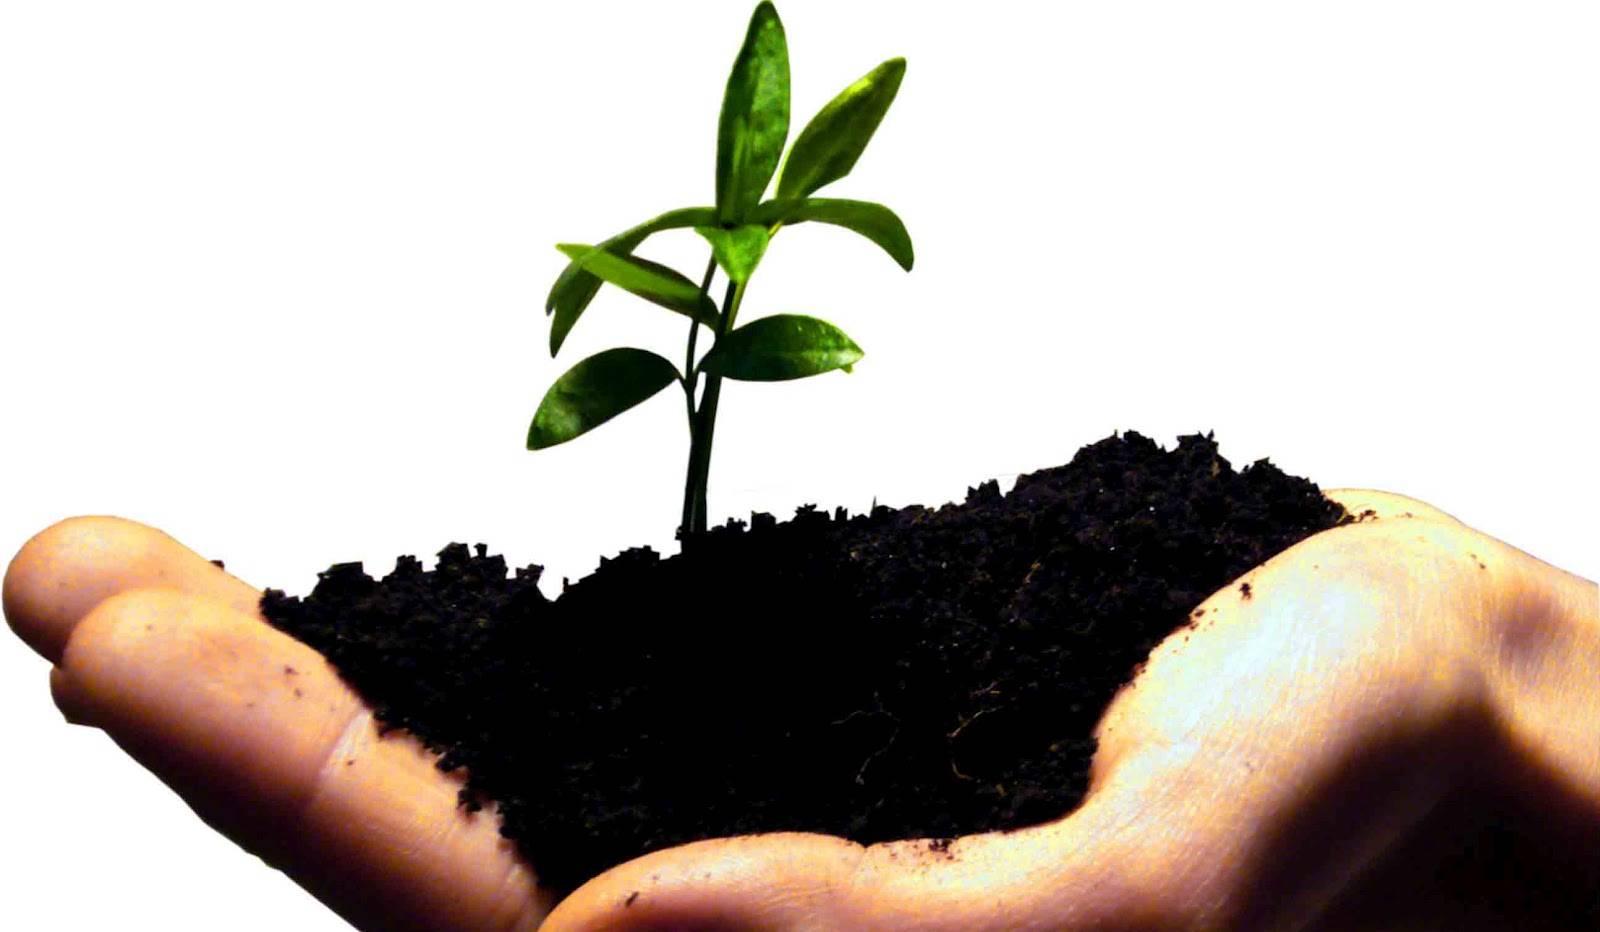 Finanziamenti a Start Up Agricole